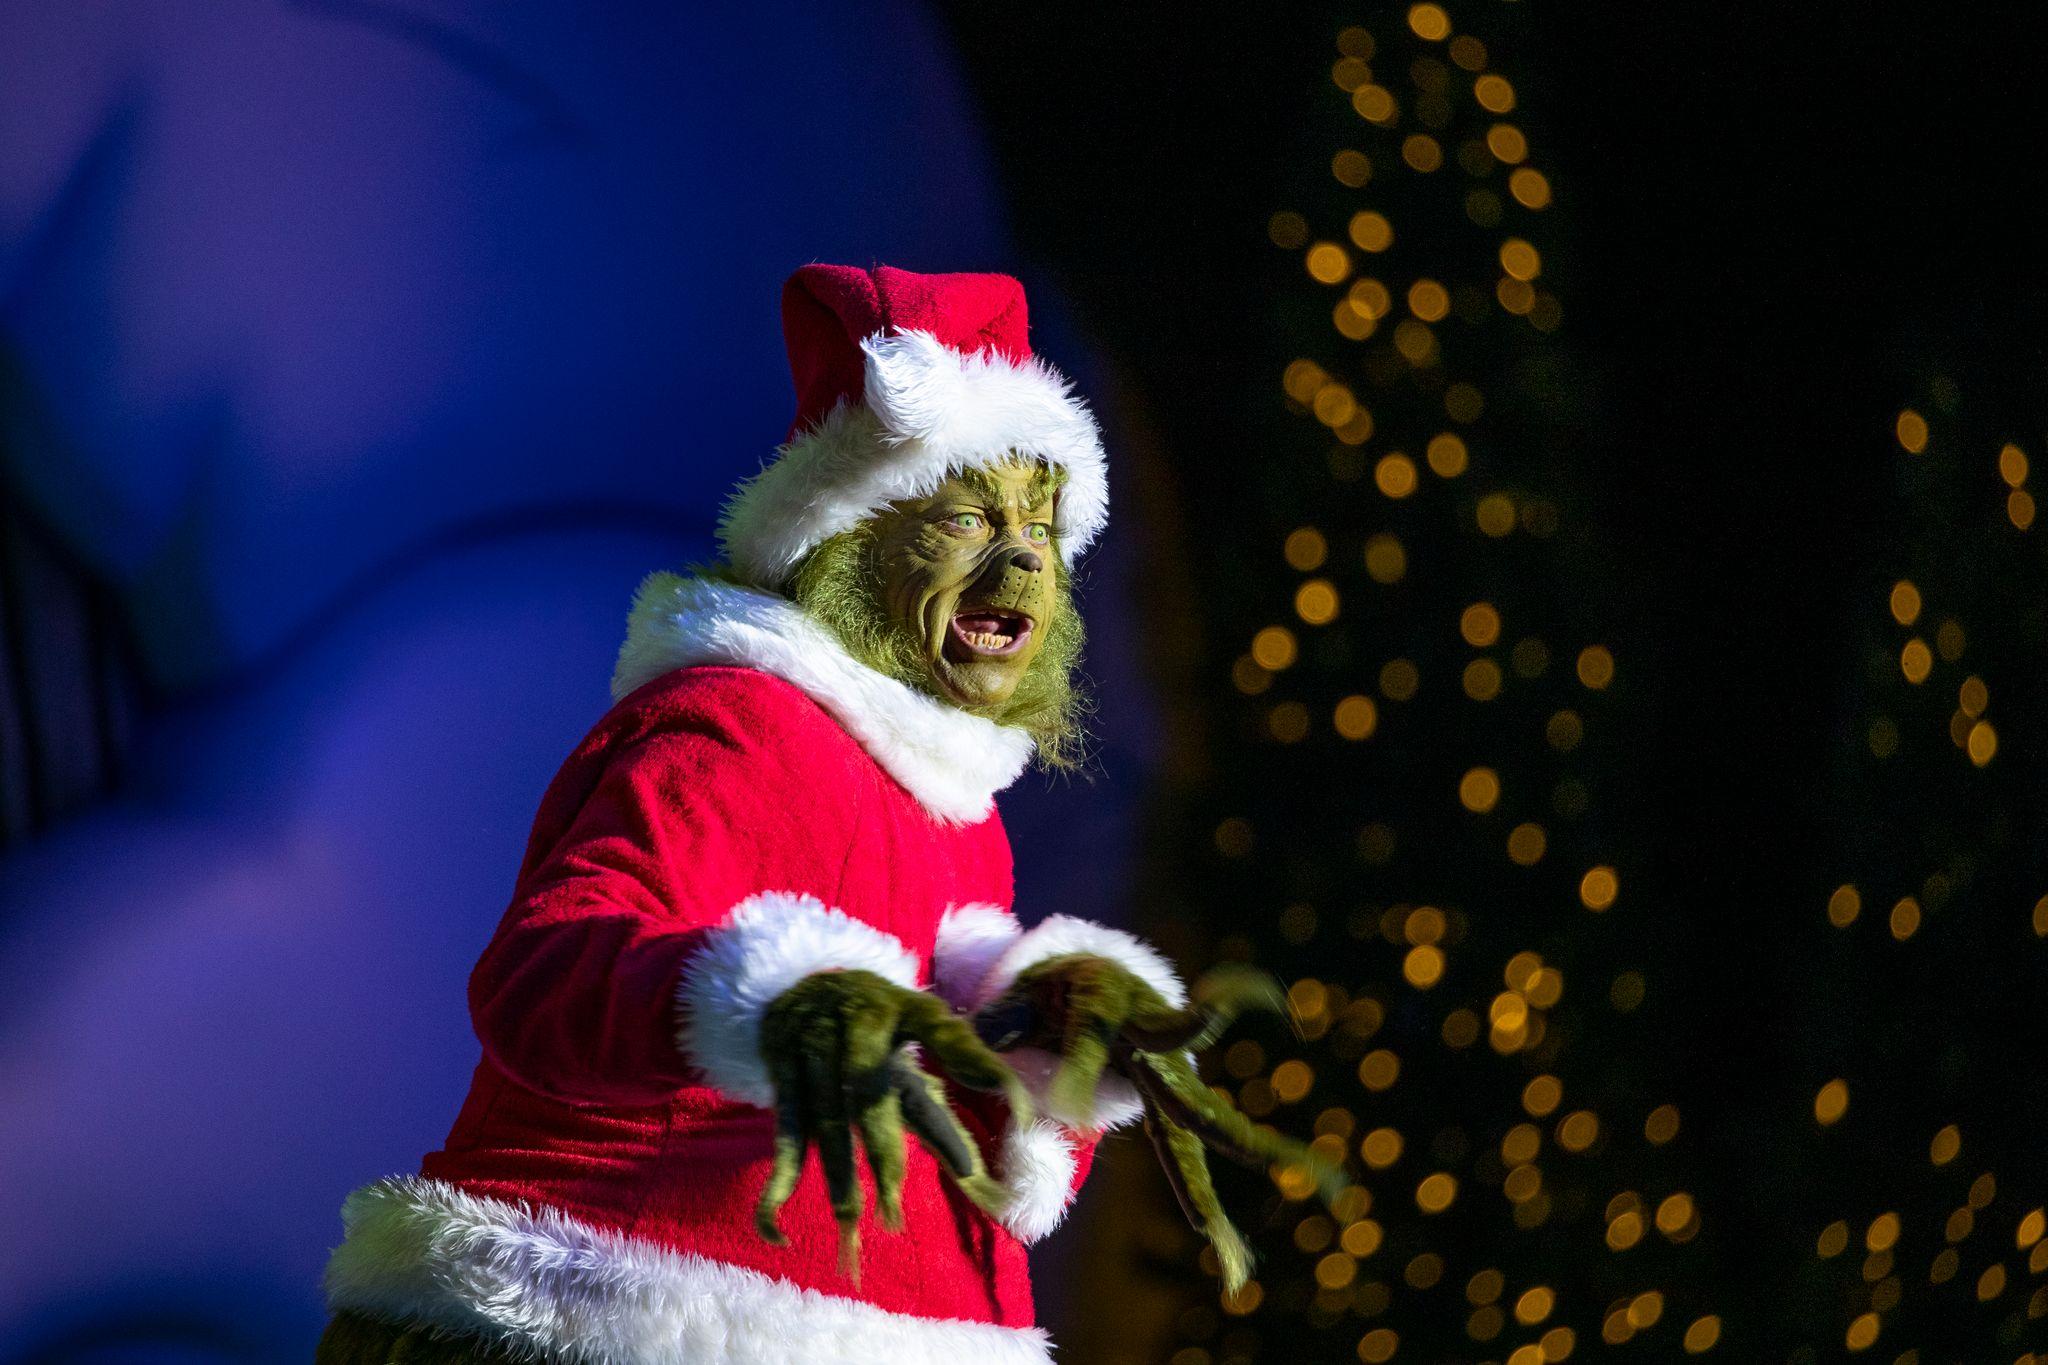 Natal Universal Orlando 2021 6